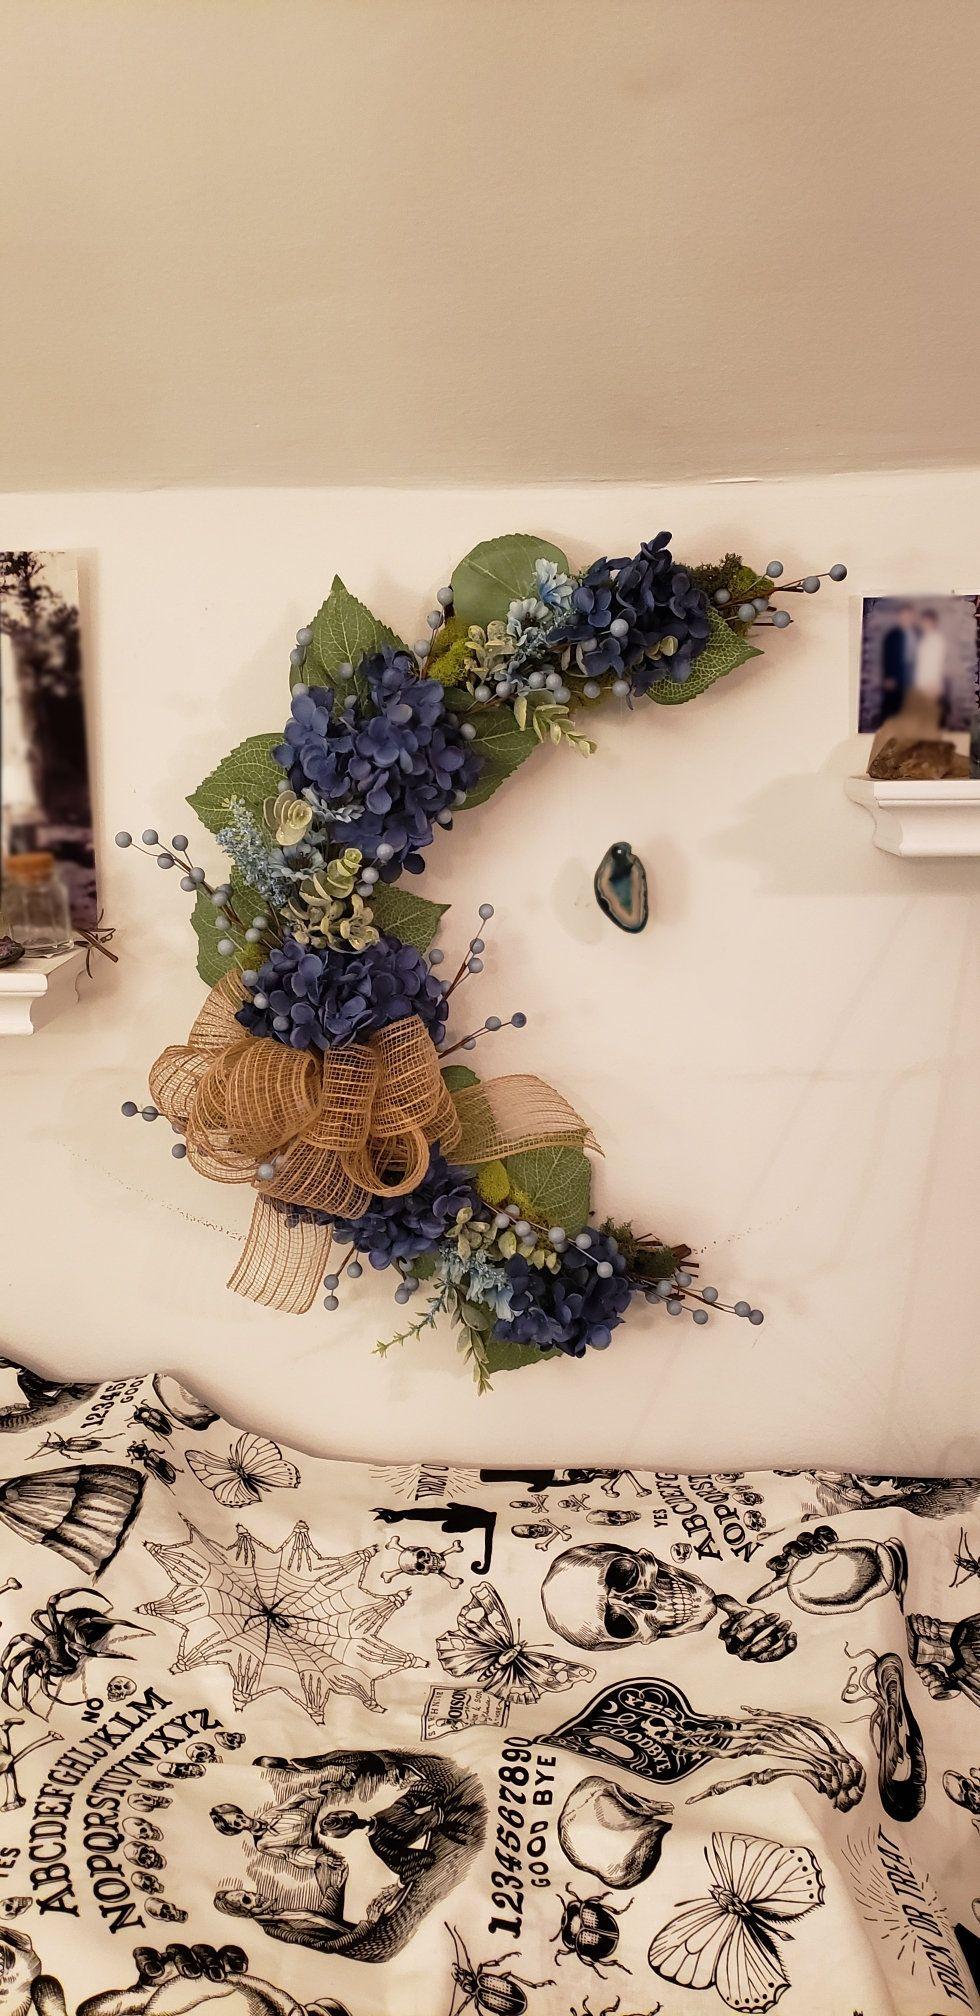 Beautiful blue hydrangea rustic flower crystal moon wreath, crescent moon wreath, moon wreath with crystals #CrescentMoonWreath #MoonWreath #BlueWreath #FrontDoorWreath #HydrangeaWreath #EverydayWreath #WallHanging #Hydrangea #DoorWreath #FlowerWreath